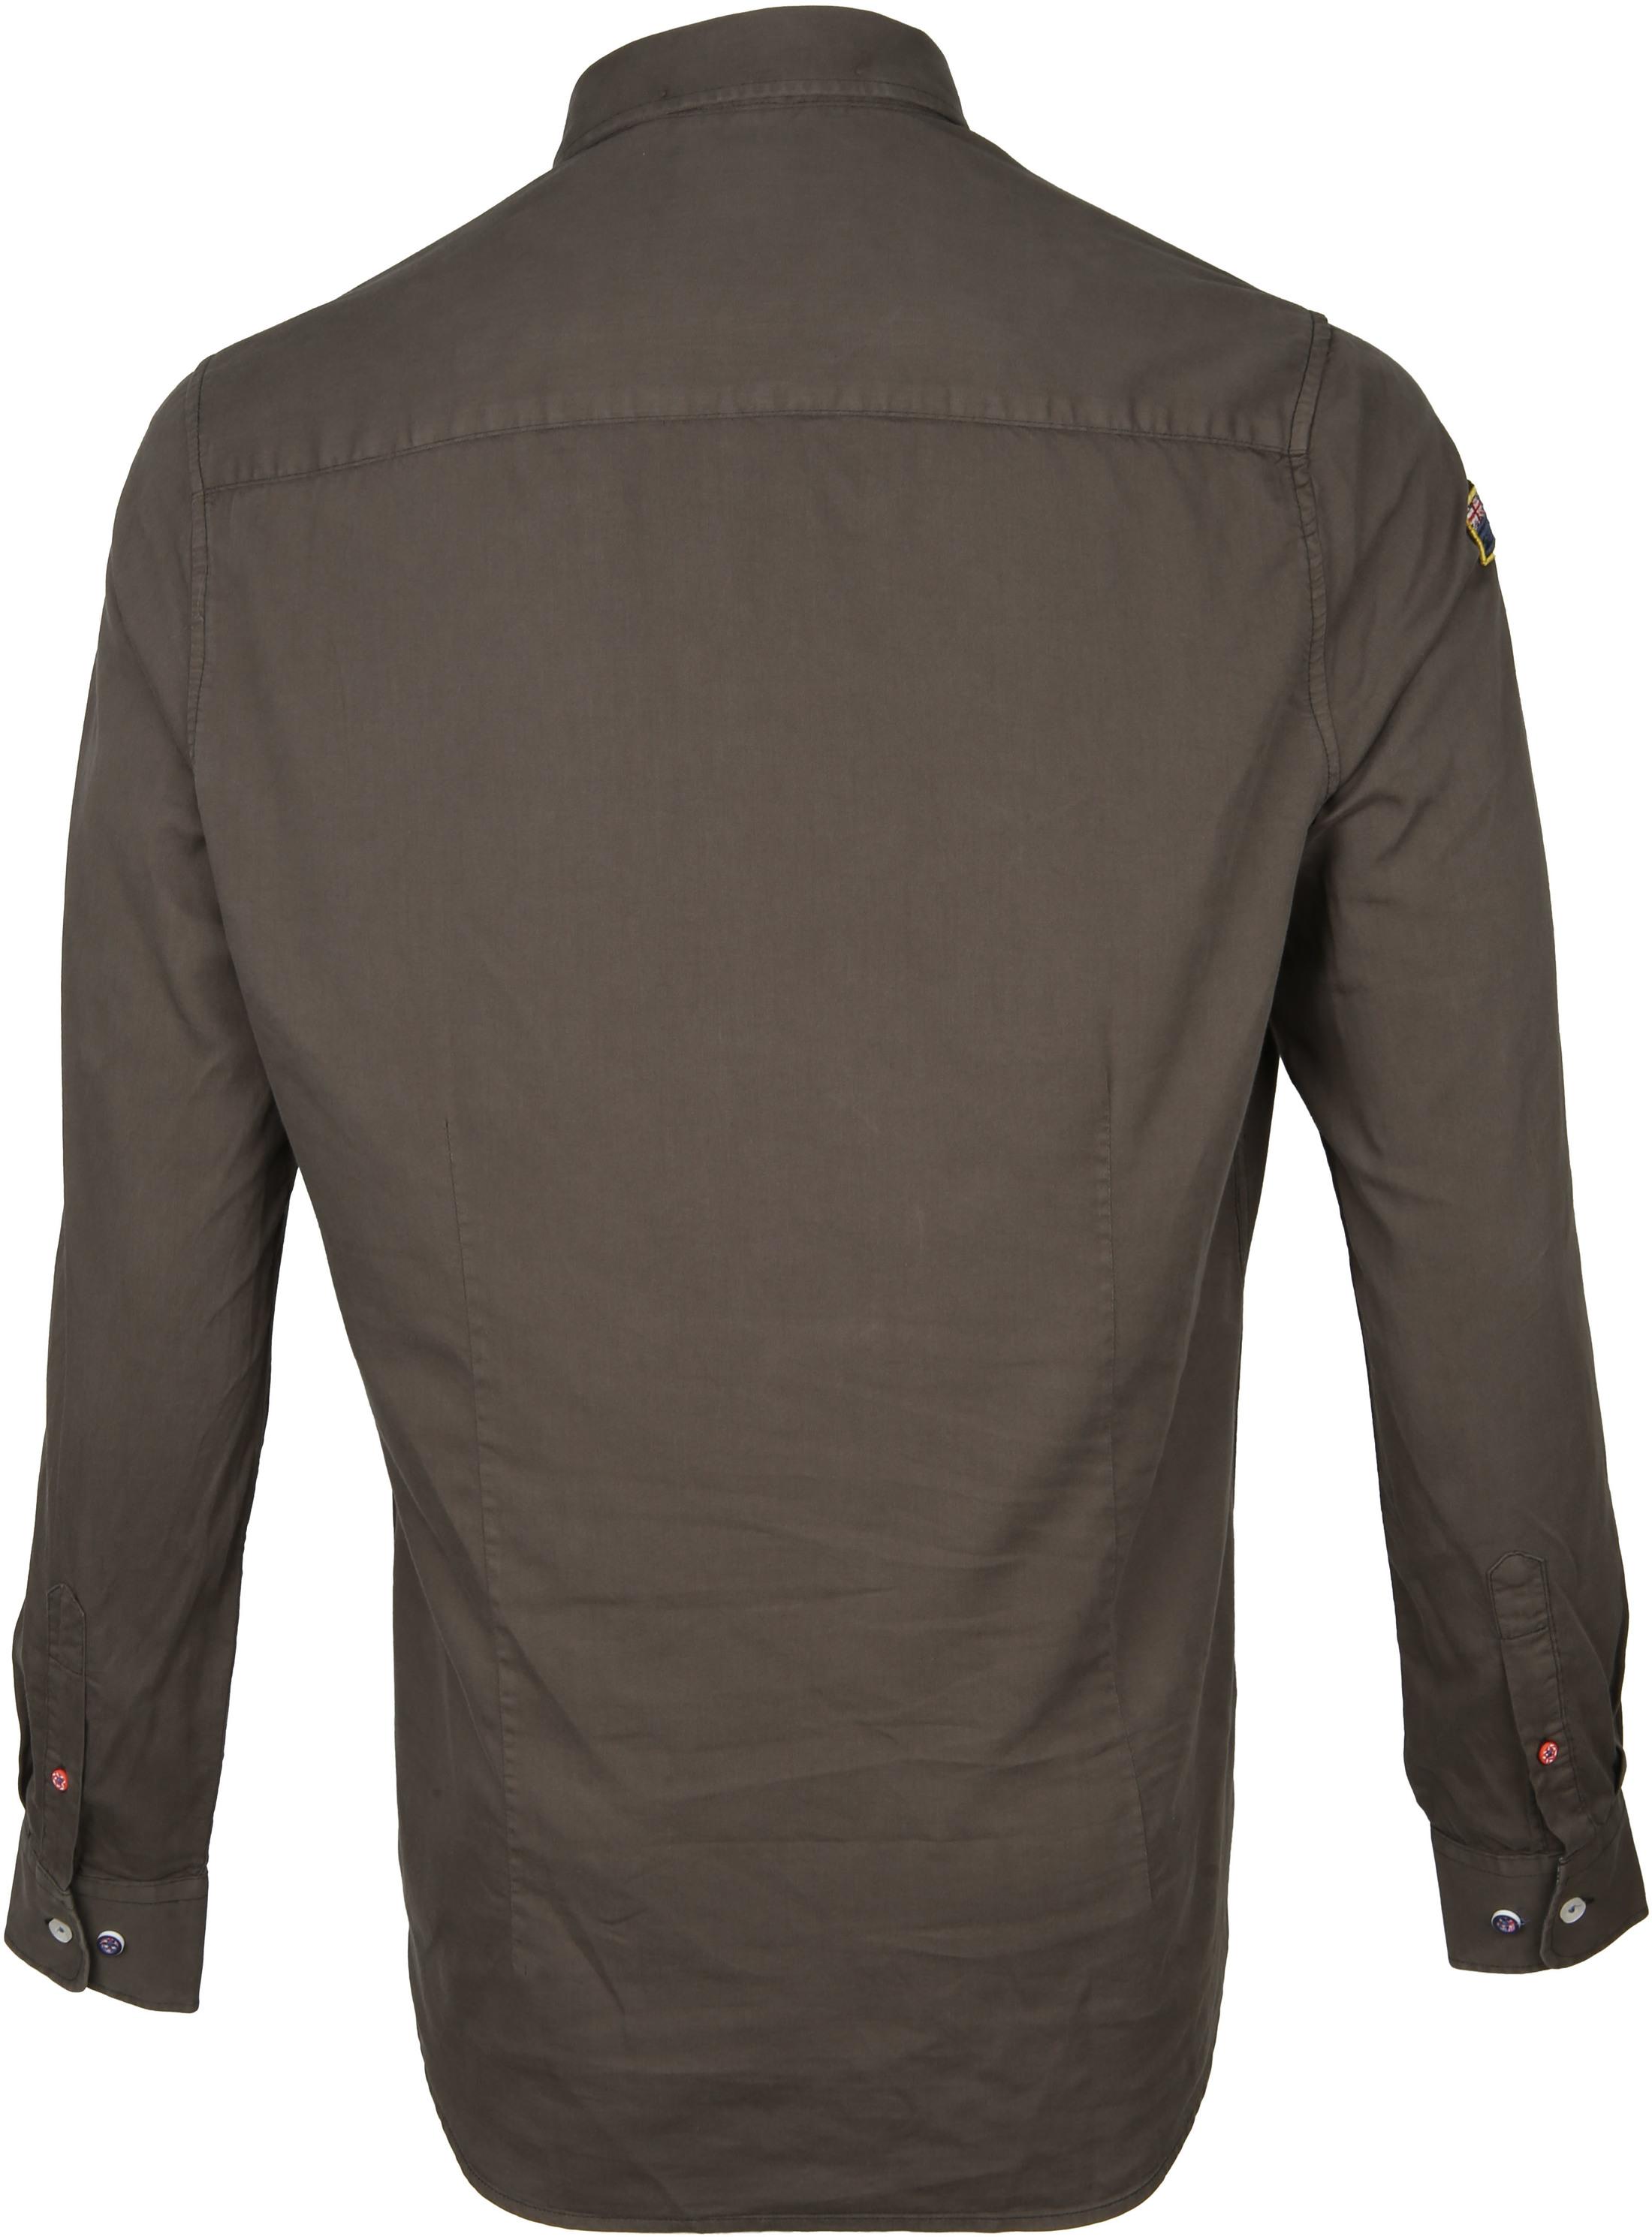 NZA Shirt Tapuaeroa Dark Green